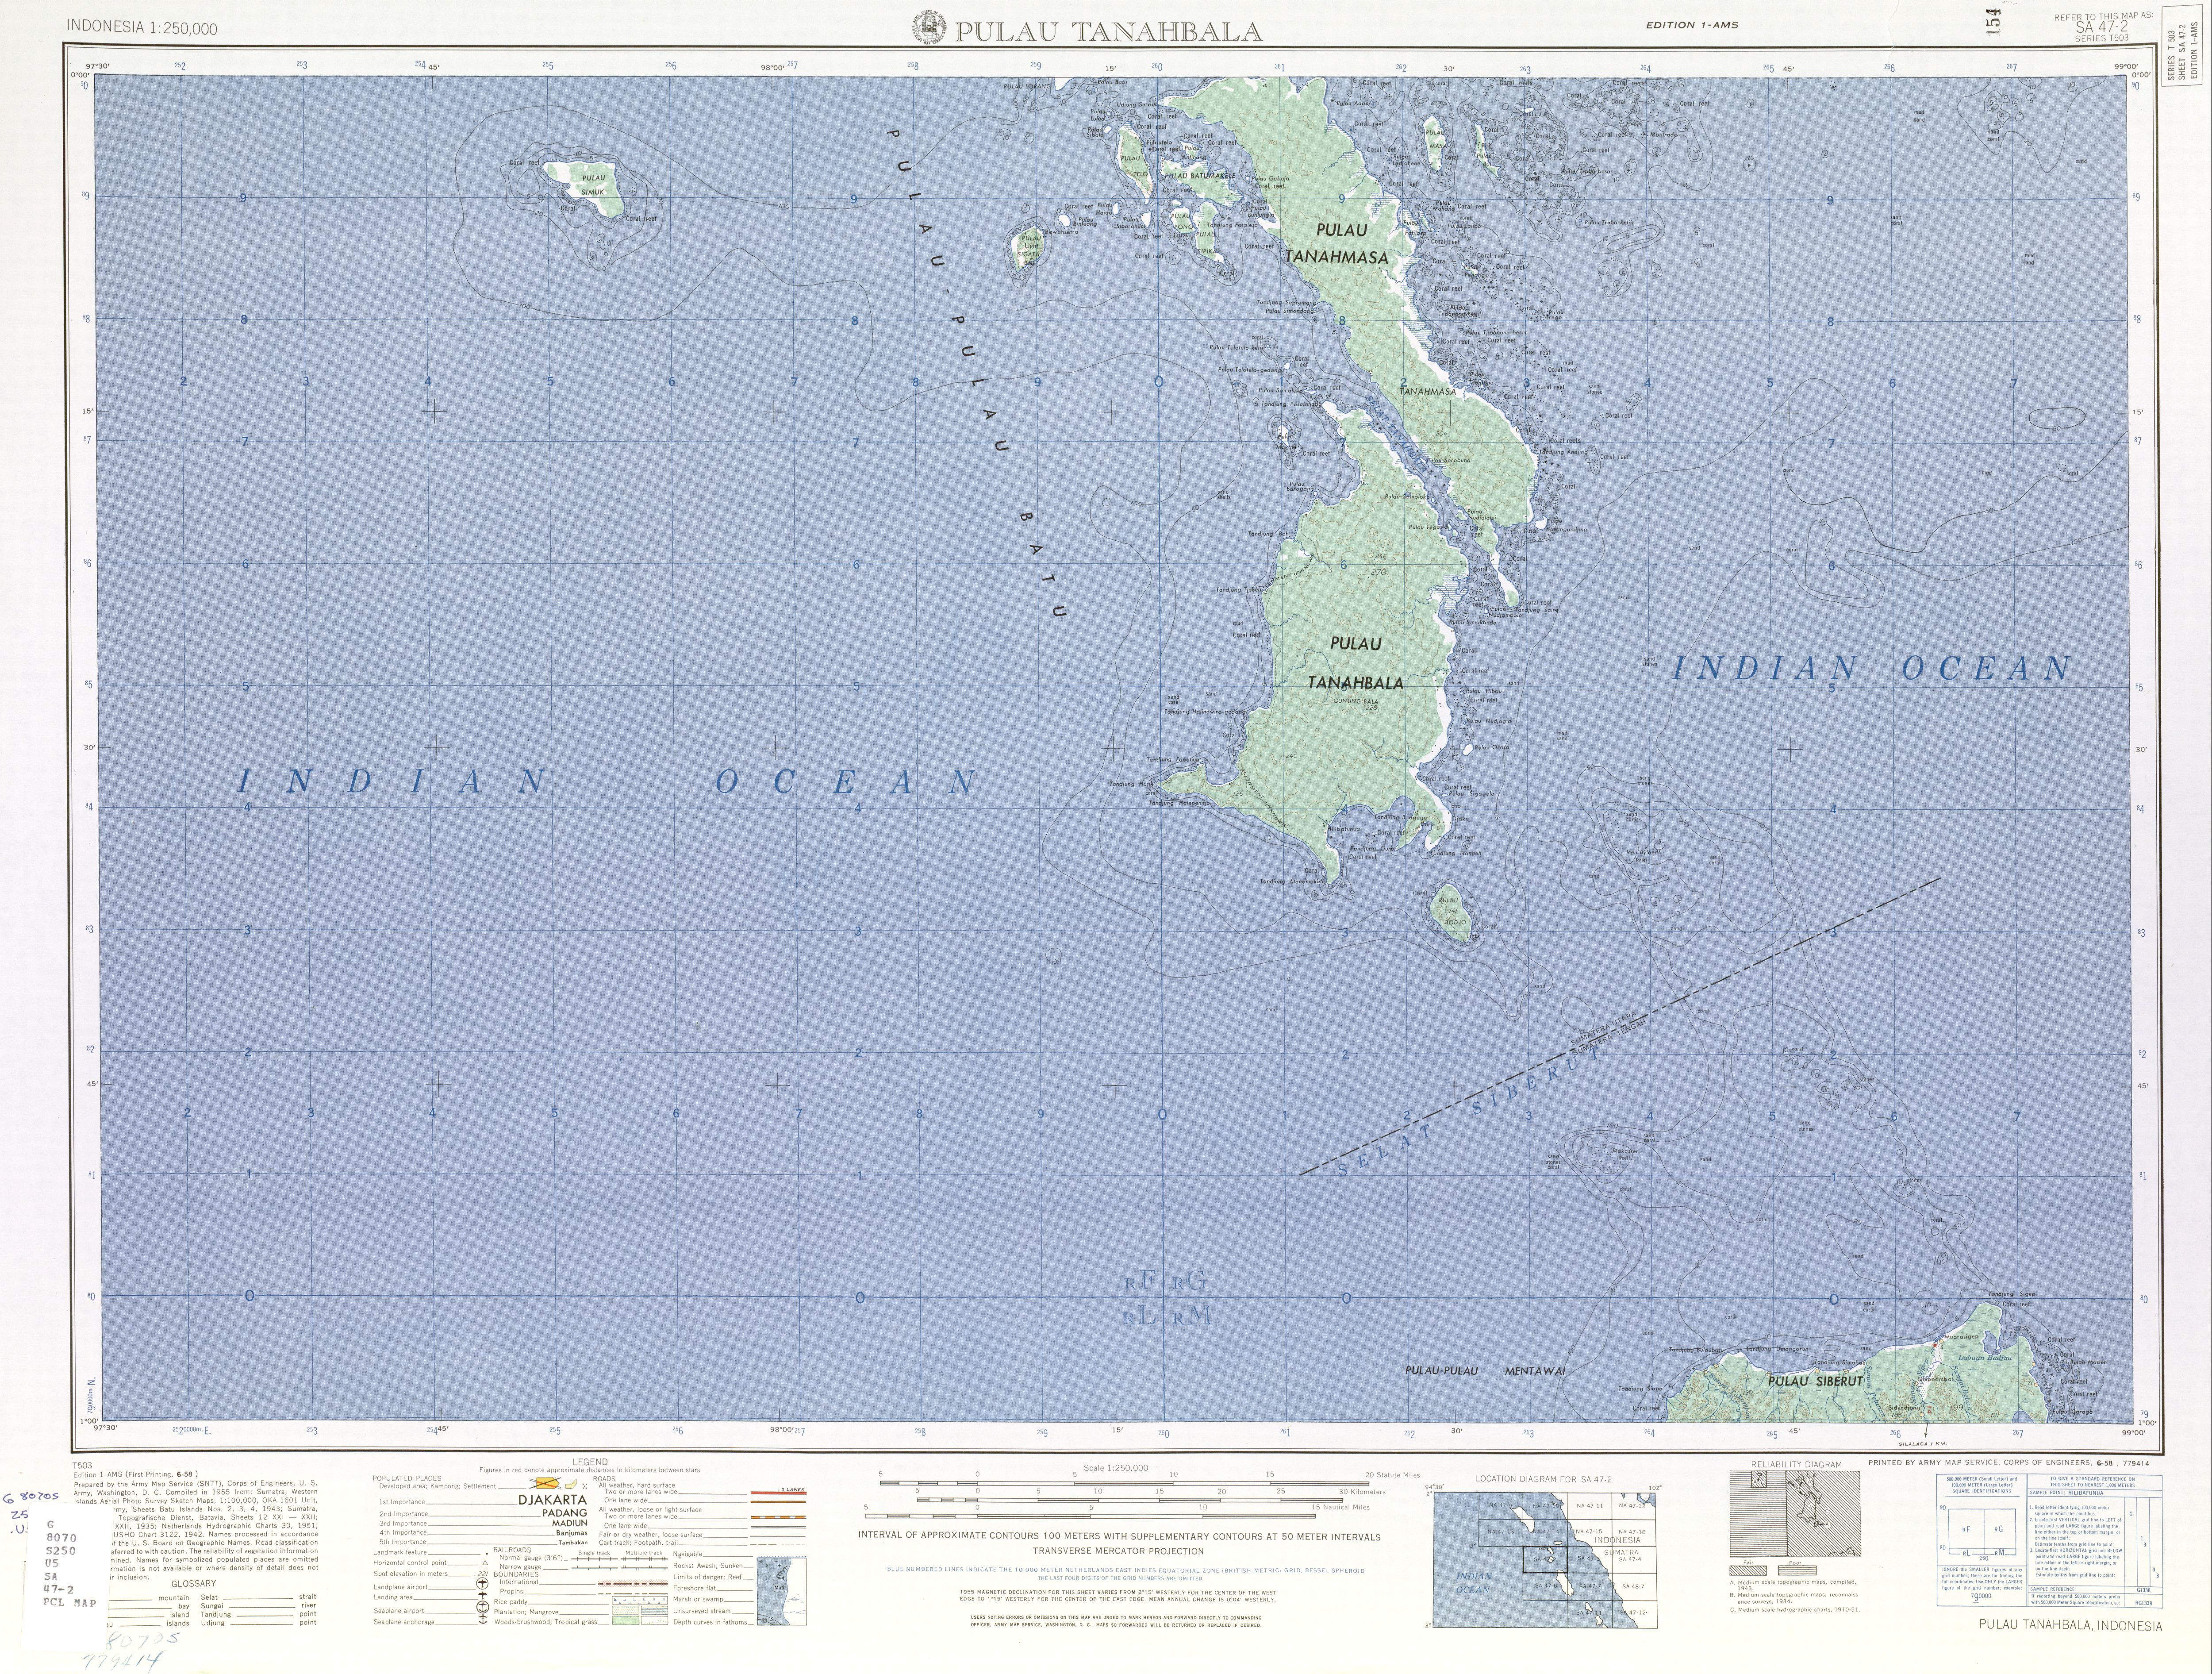 Pulau Tanahbala